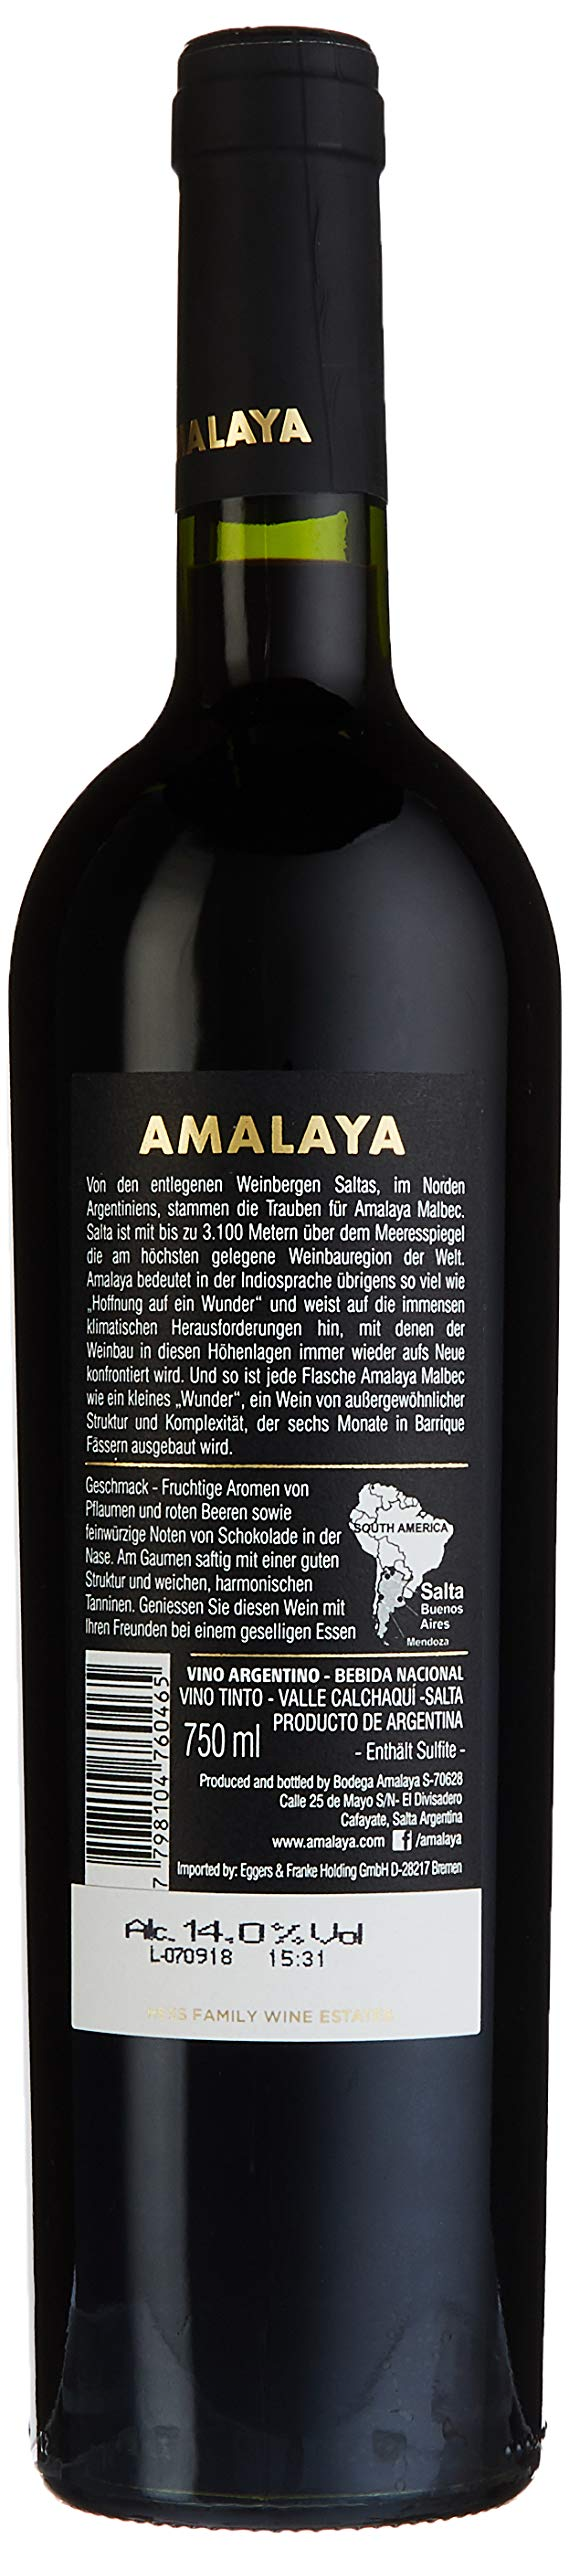 Amalaya-Malbec-Valle-Calchagui-Salta